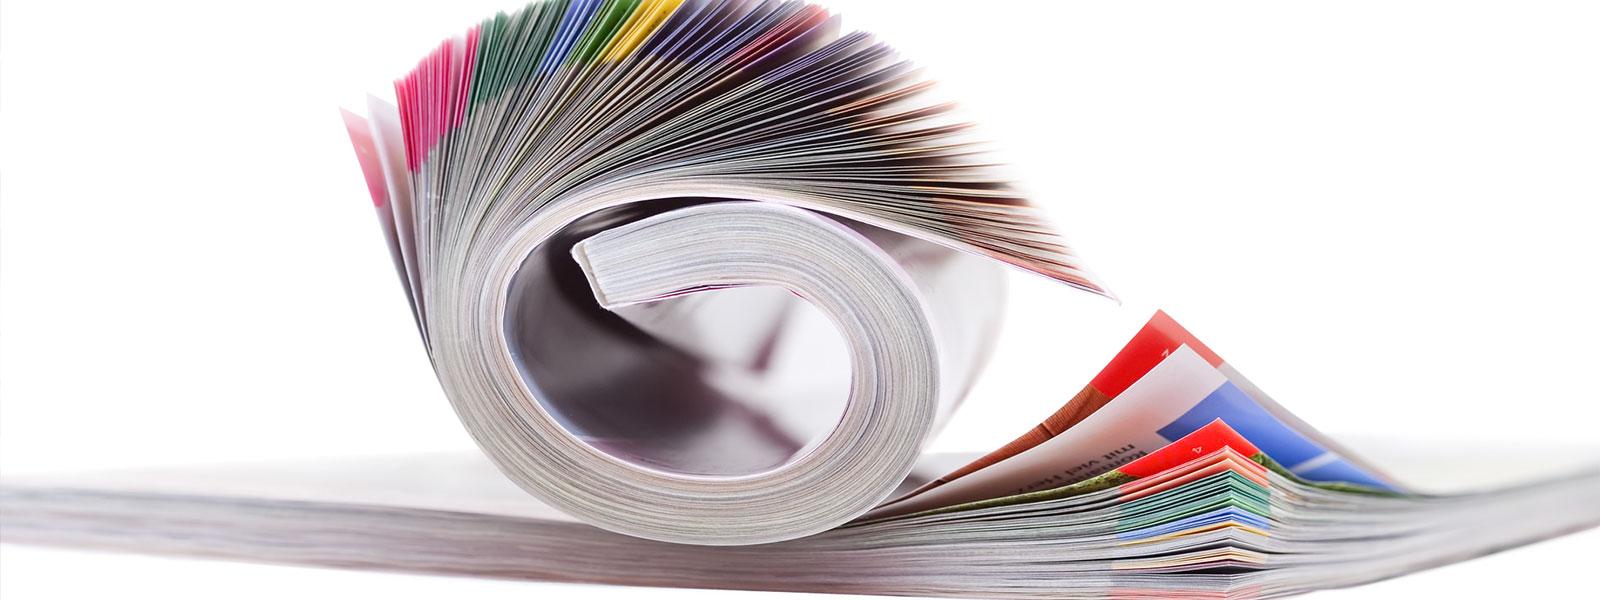 impression de livre brochure